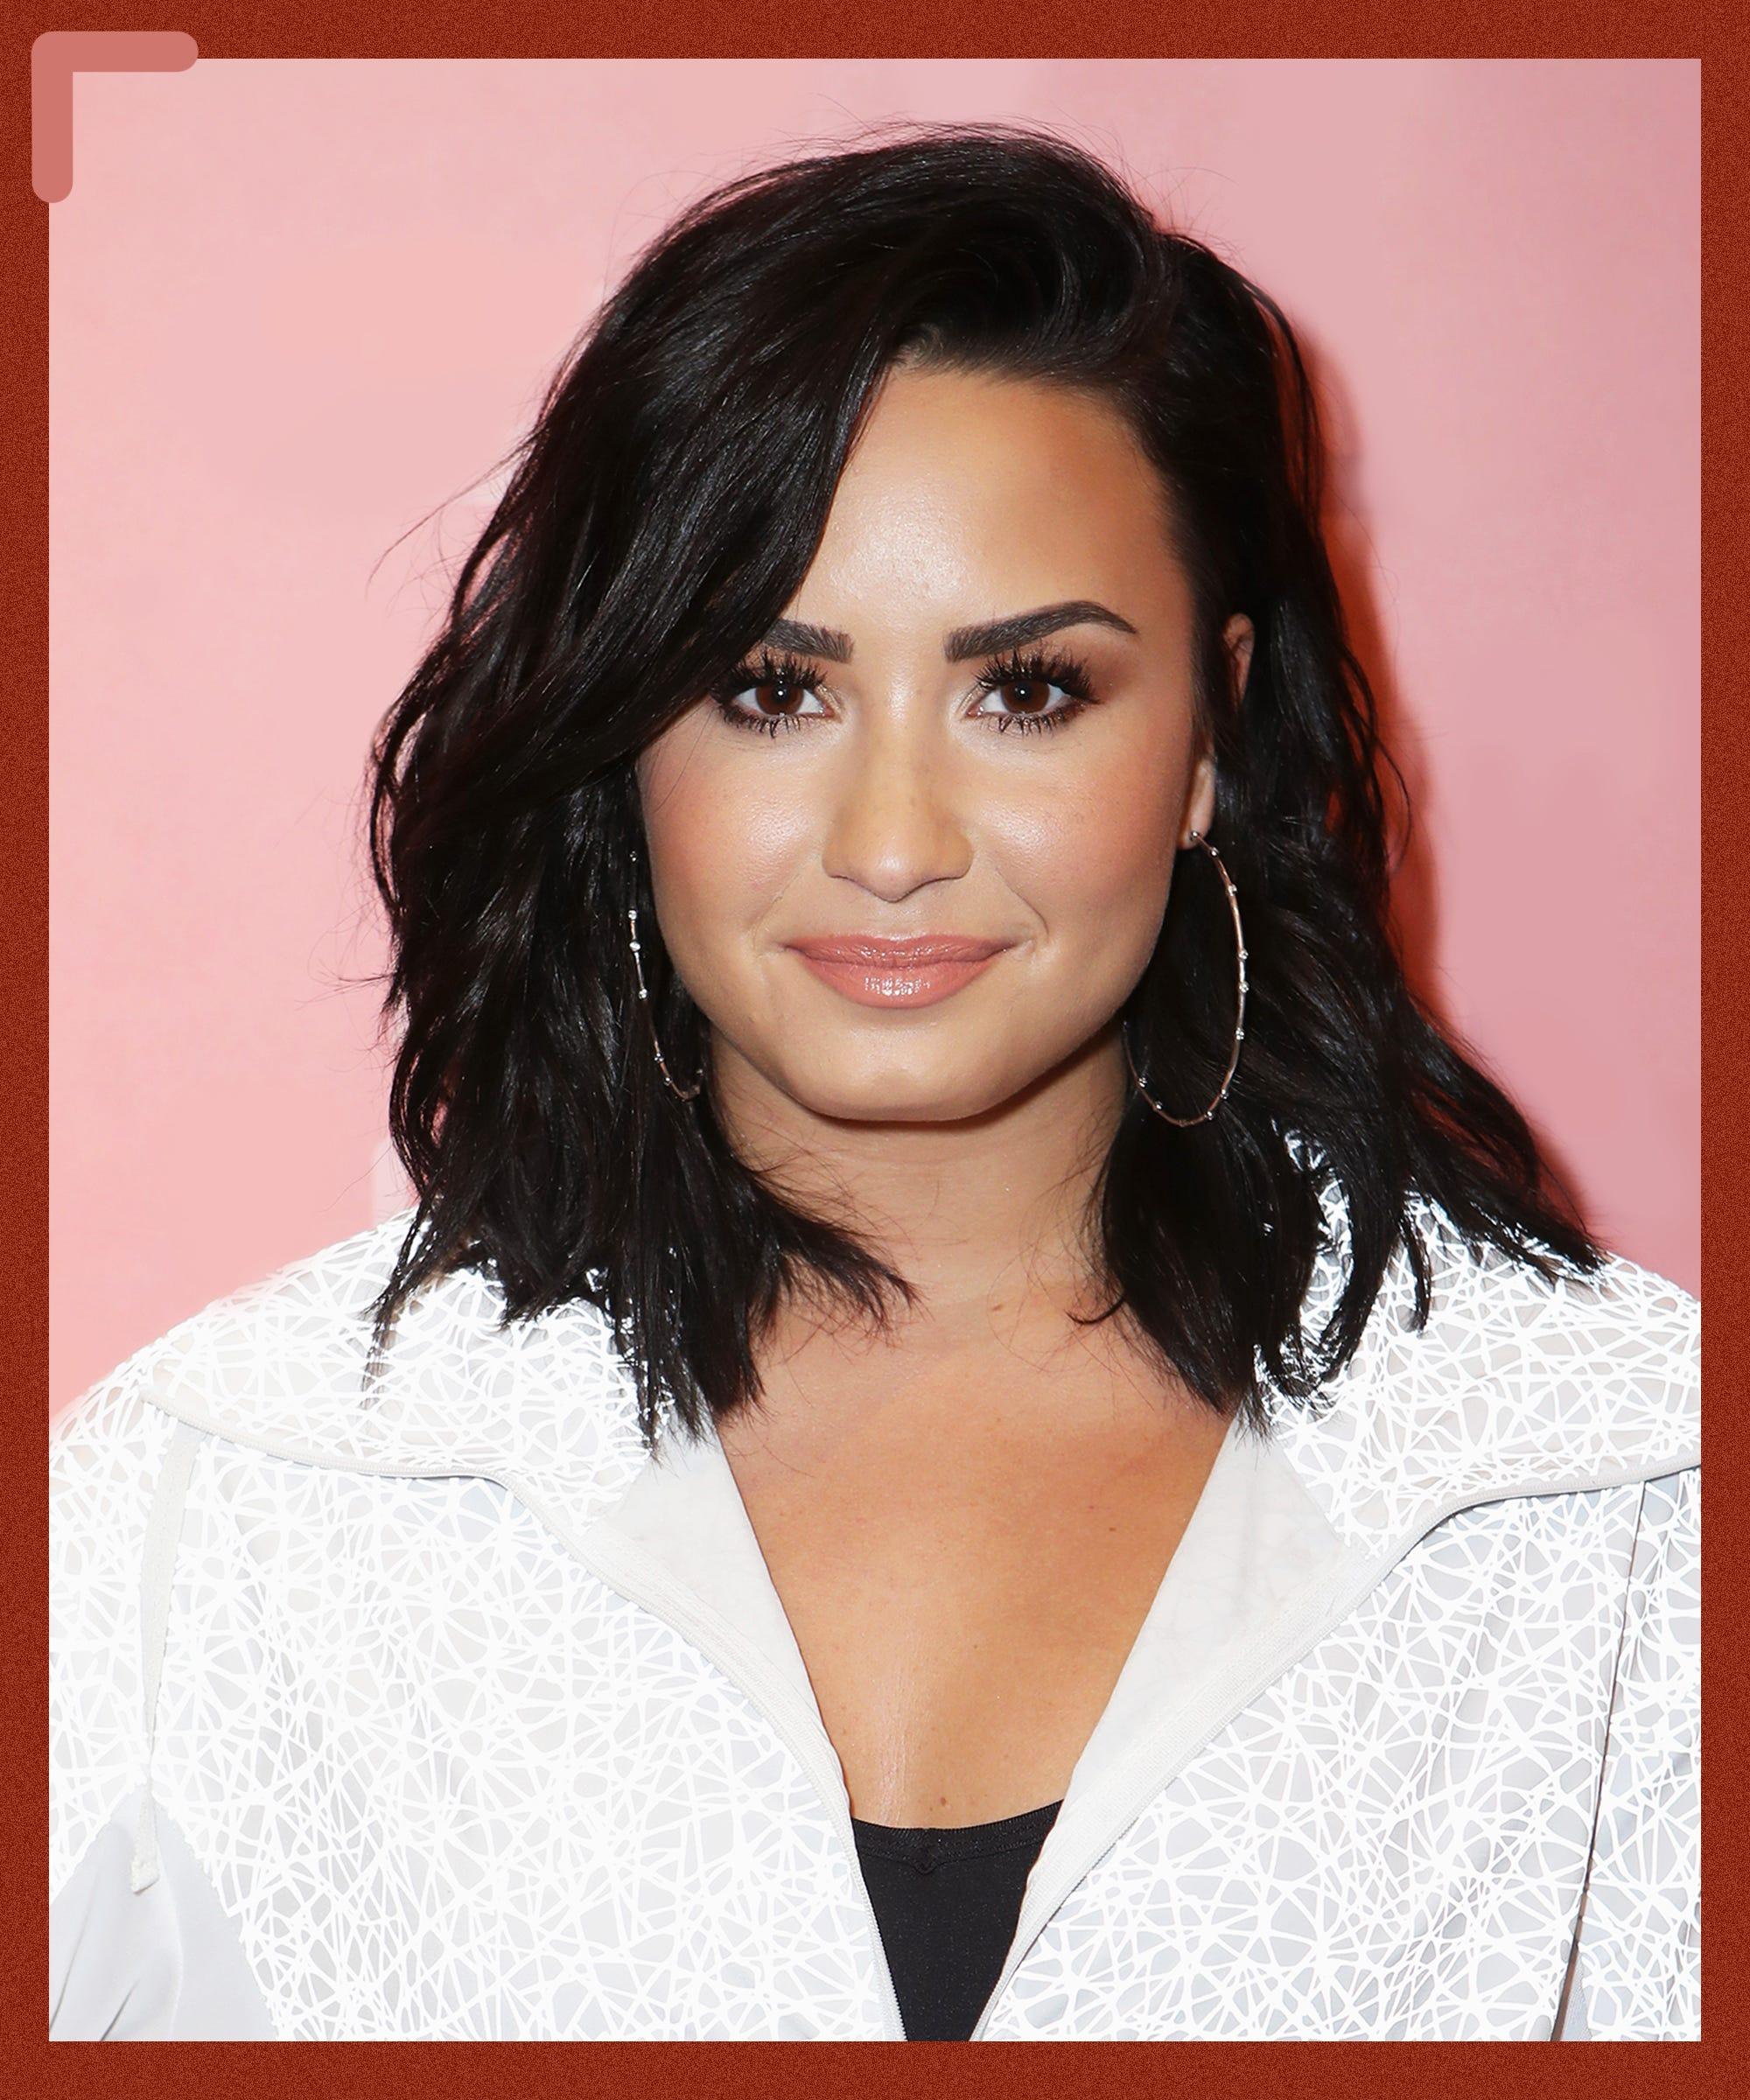 Demi Lovato Reveals Tiny Finger Tattoo About Self Love